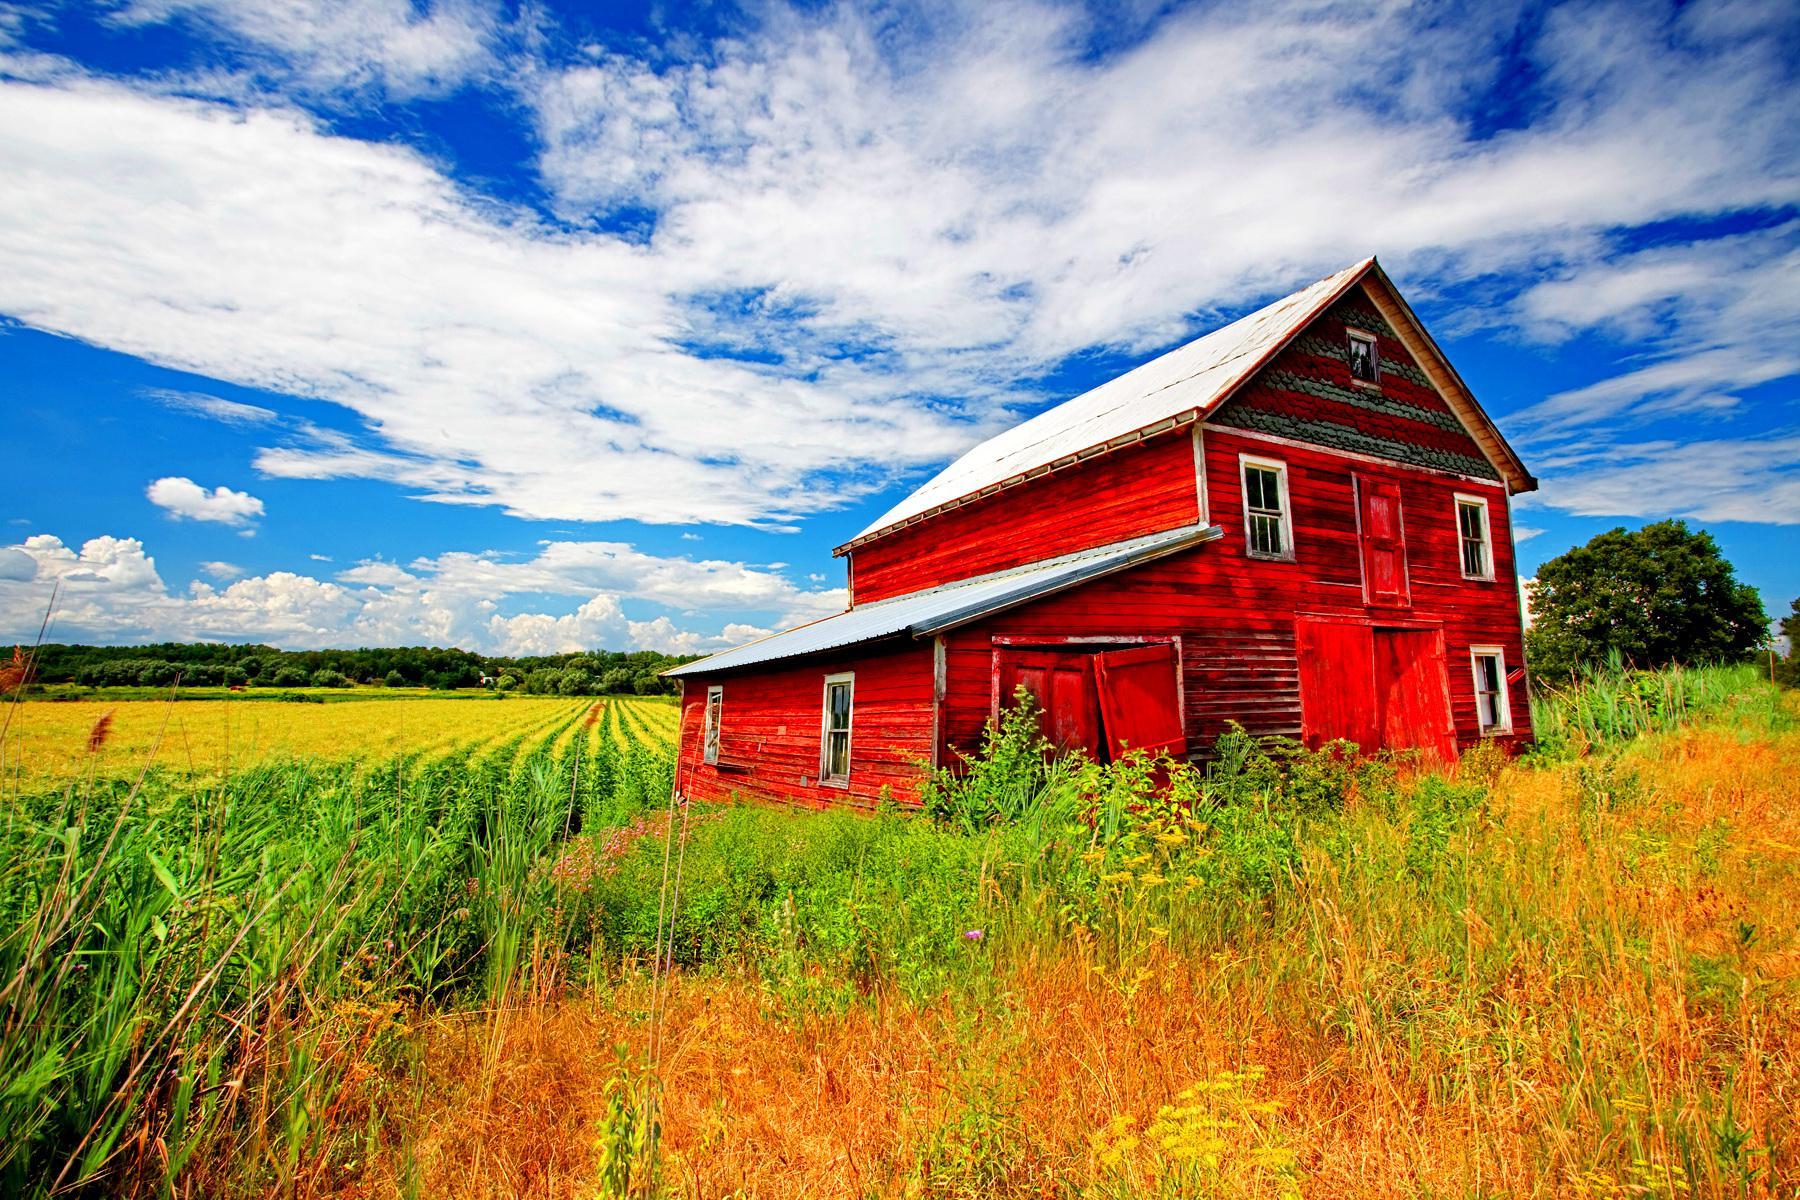 barn wallpaper - photo #31